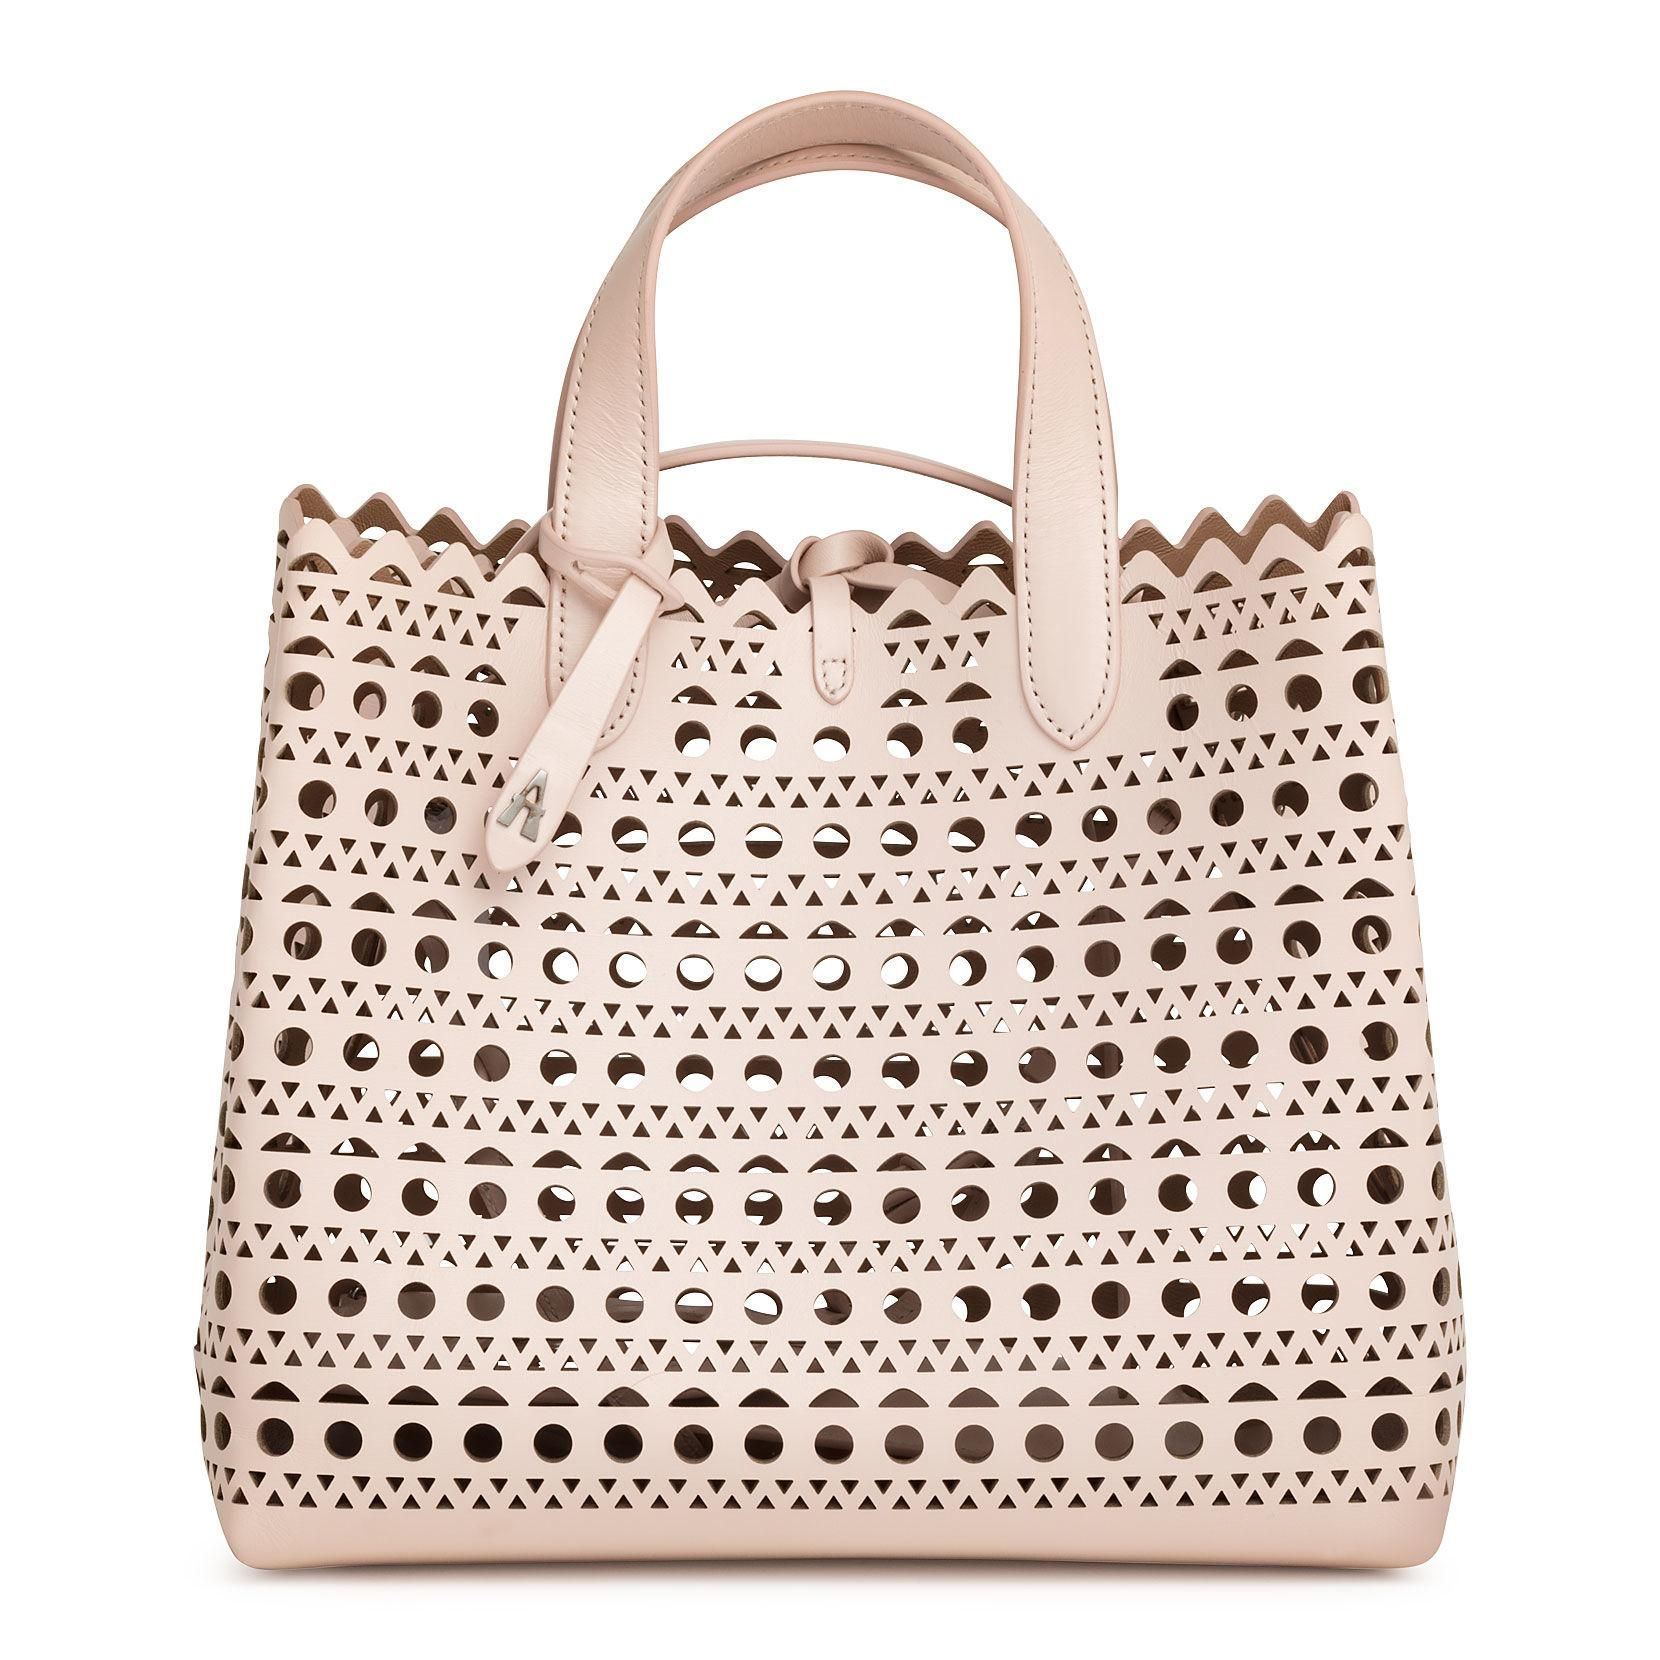 61fd477c5 Alaïa Frida Medium Blush Laser-cut Bag in Pink - Lyst